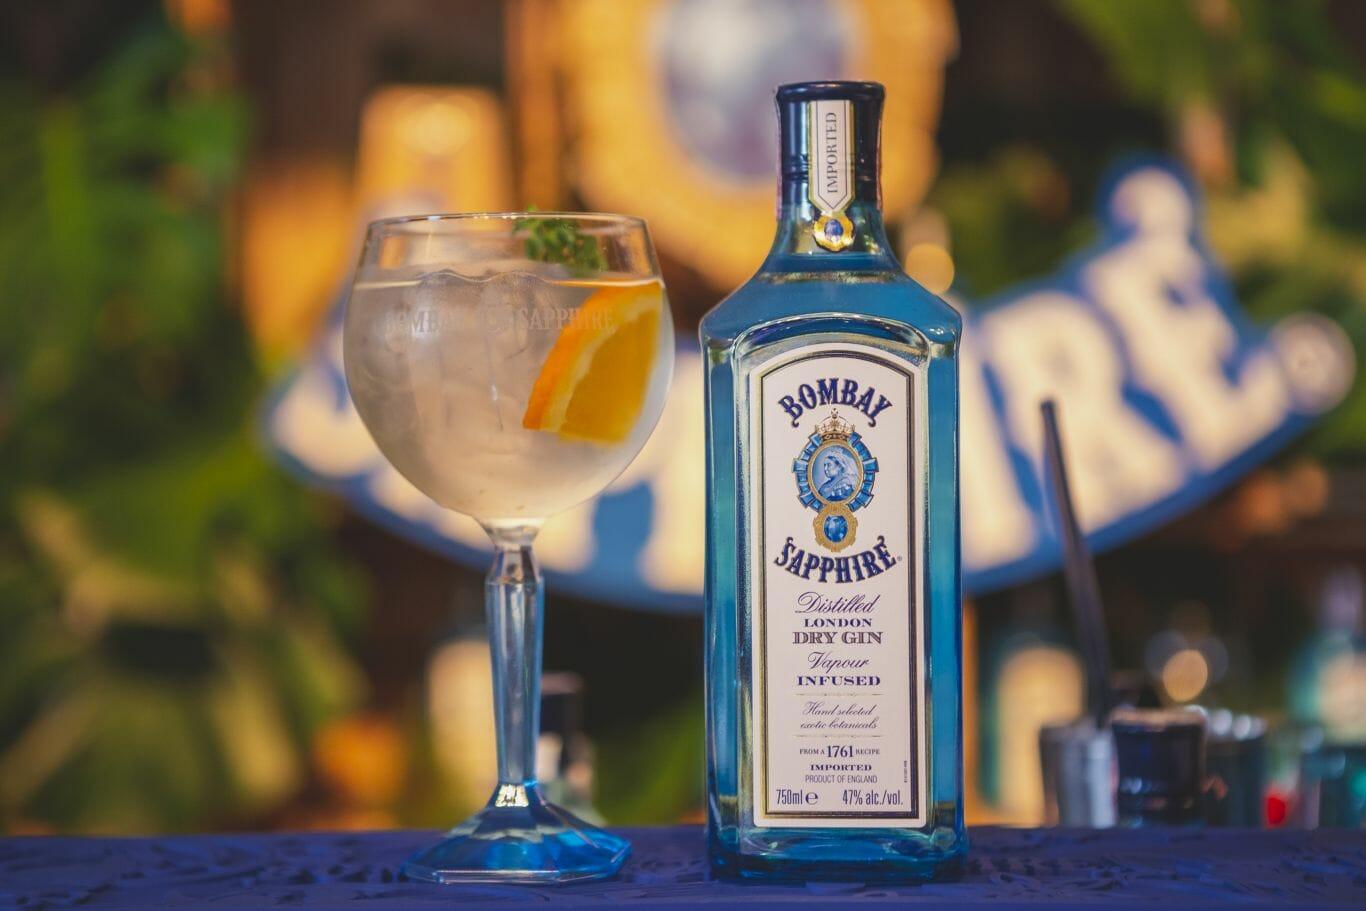 Bombay é uma das marcas participantes do World Gin Day